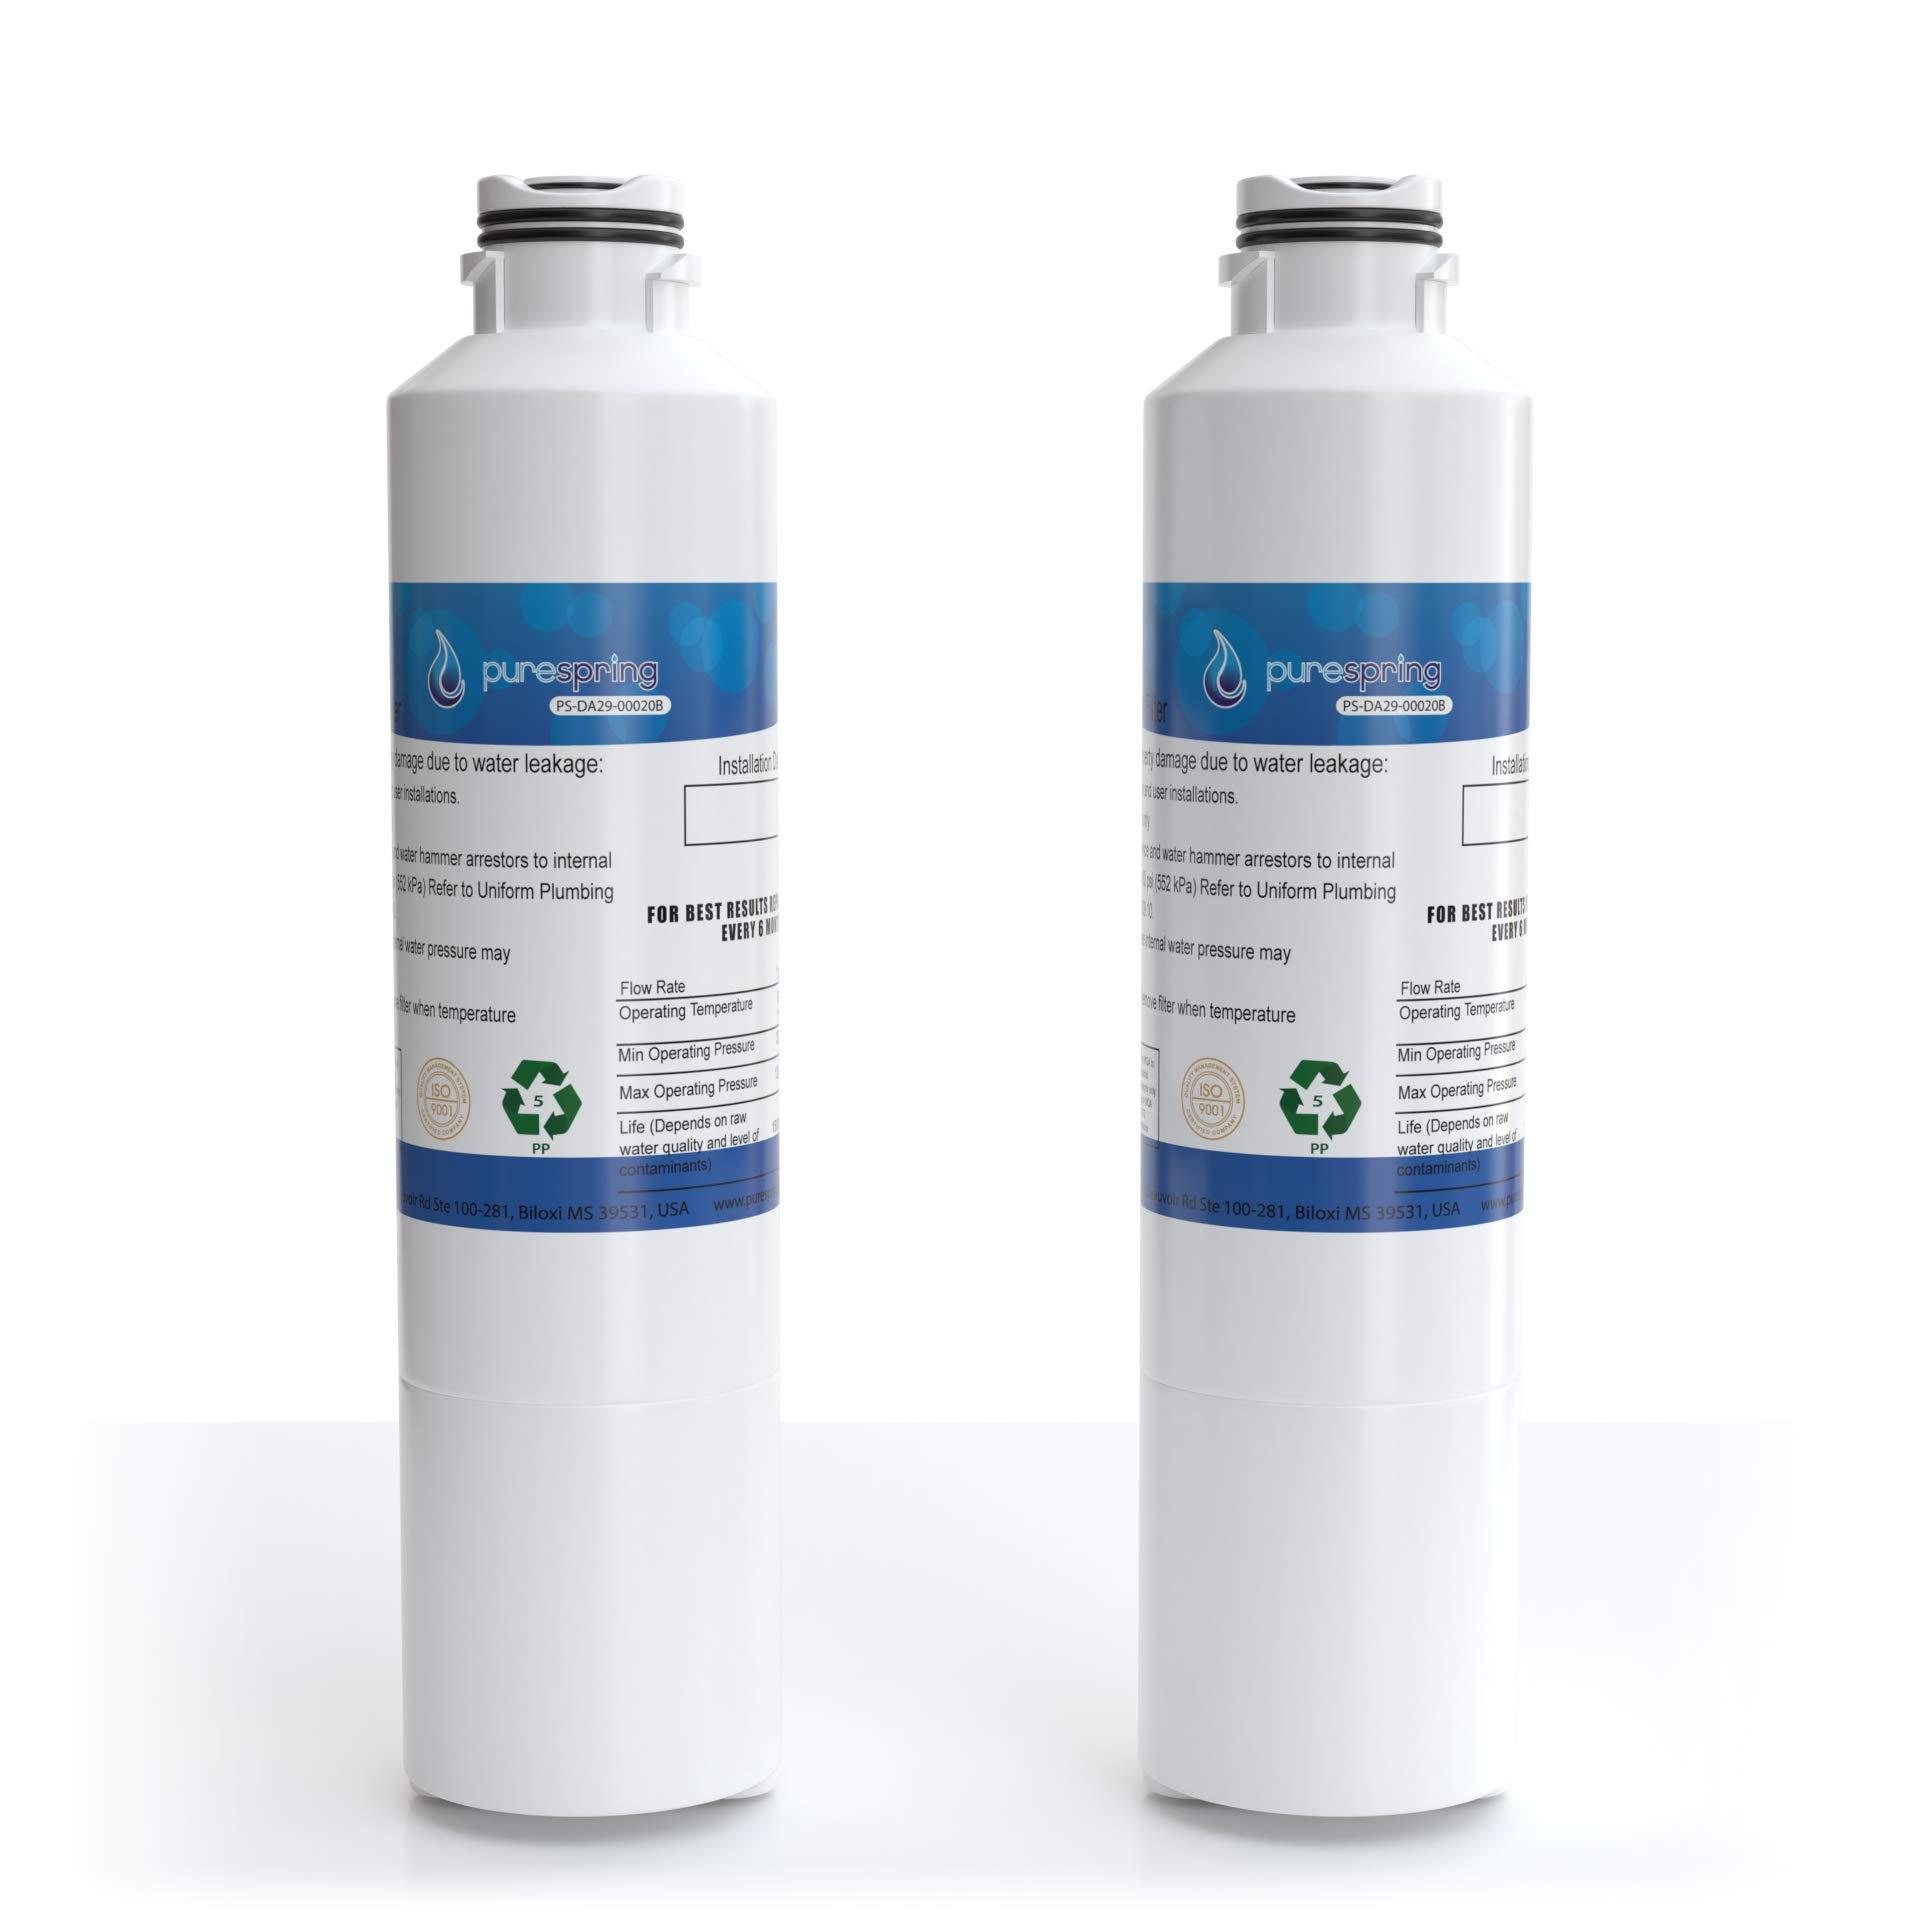 PureSpring Samsung-DA29-00020B Refrigerator Water-Filter Compatible Cartridge - Replaces Samsung DA29-00020B, DA29-00020A, HAF-CIN/EXP, Kenmore 46-9101 (2 Pack)